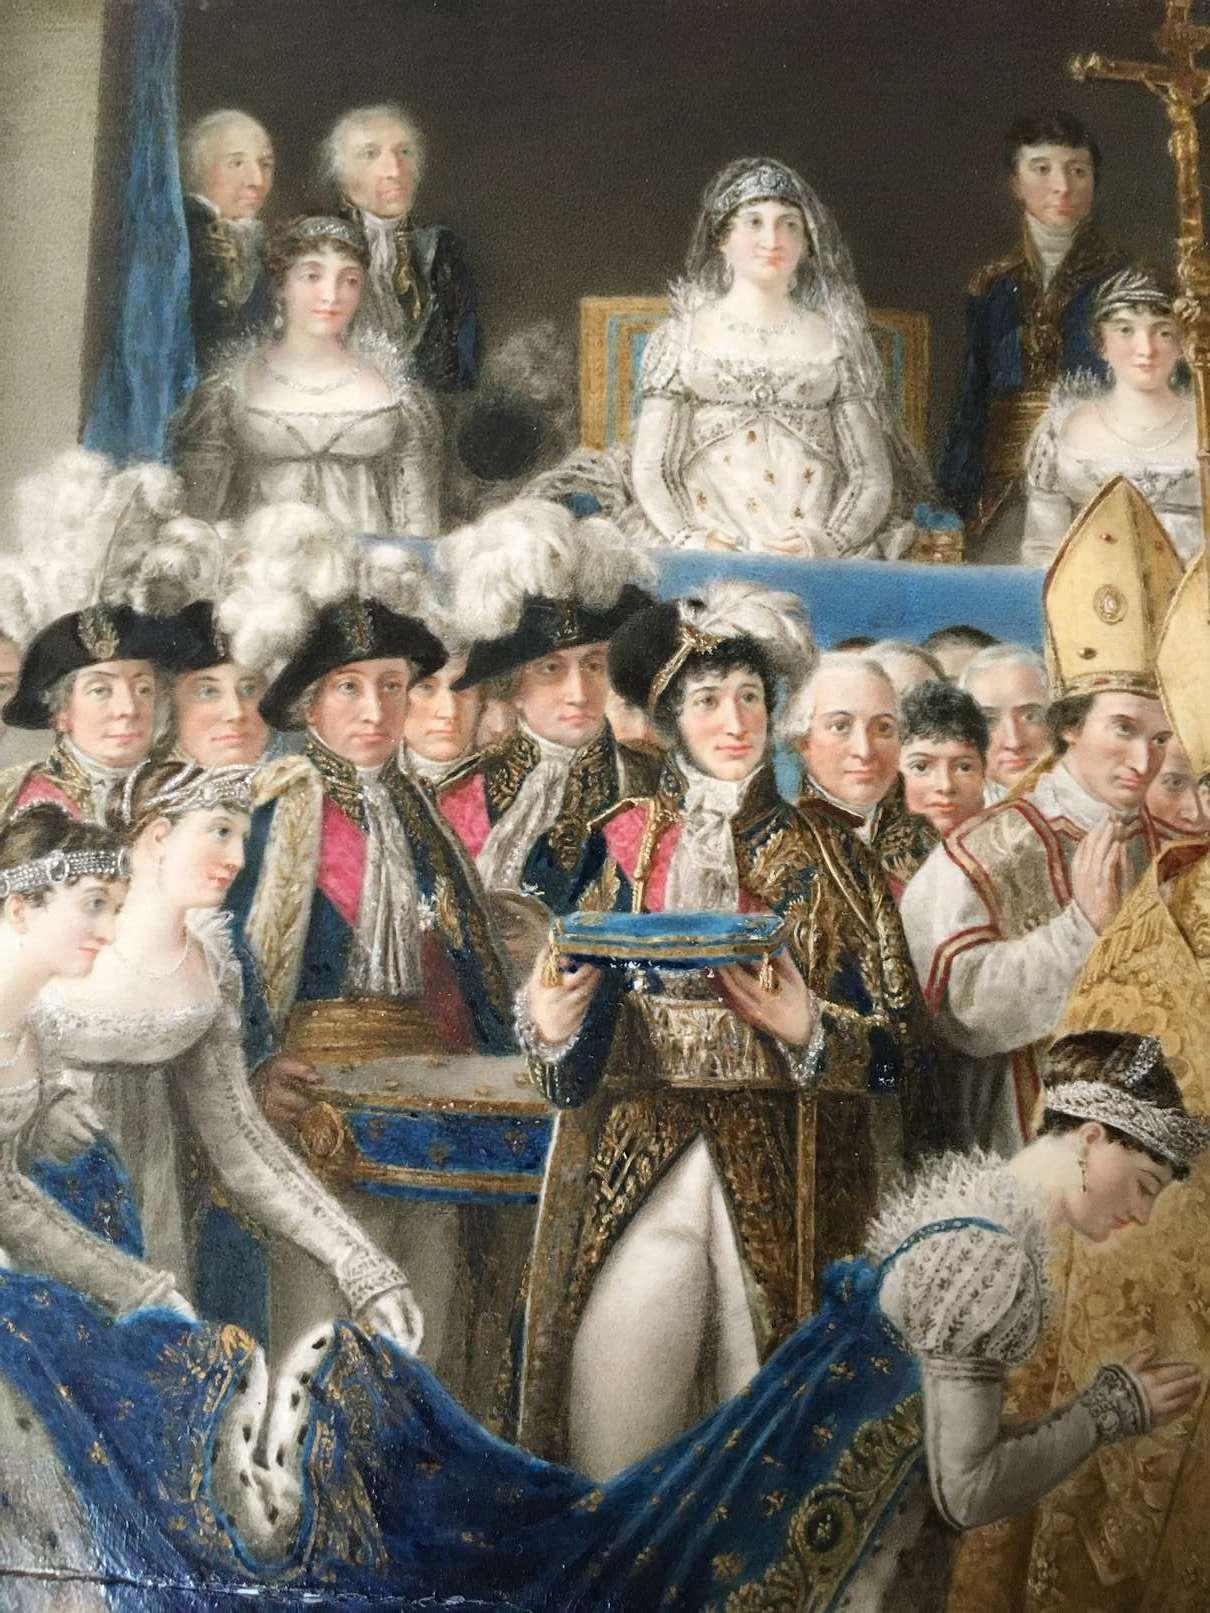 ivoire-miniature-napoleon-imperatrice-josephine-art-restauration-paris-louvre.jpg